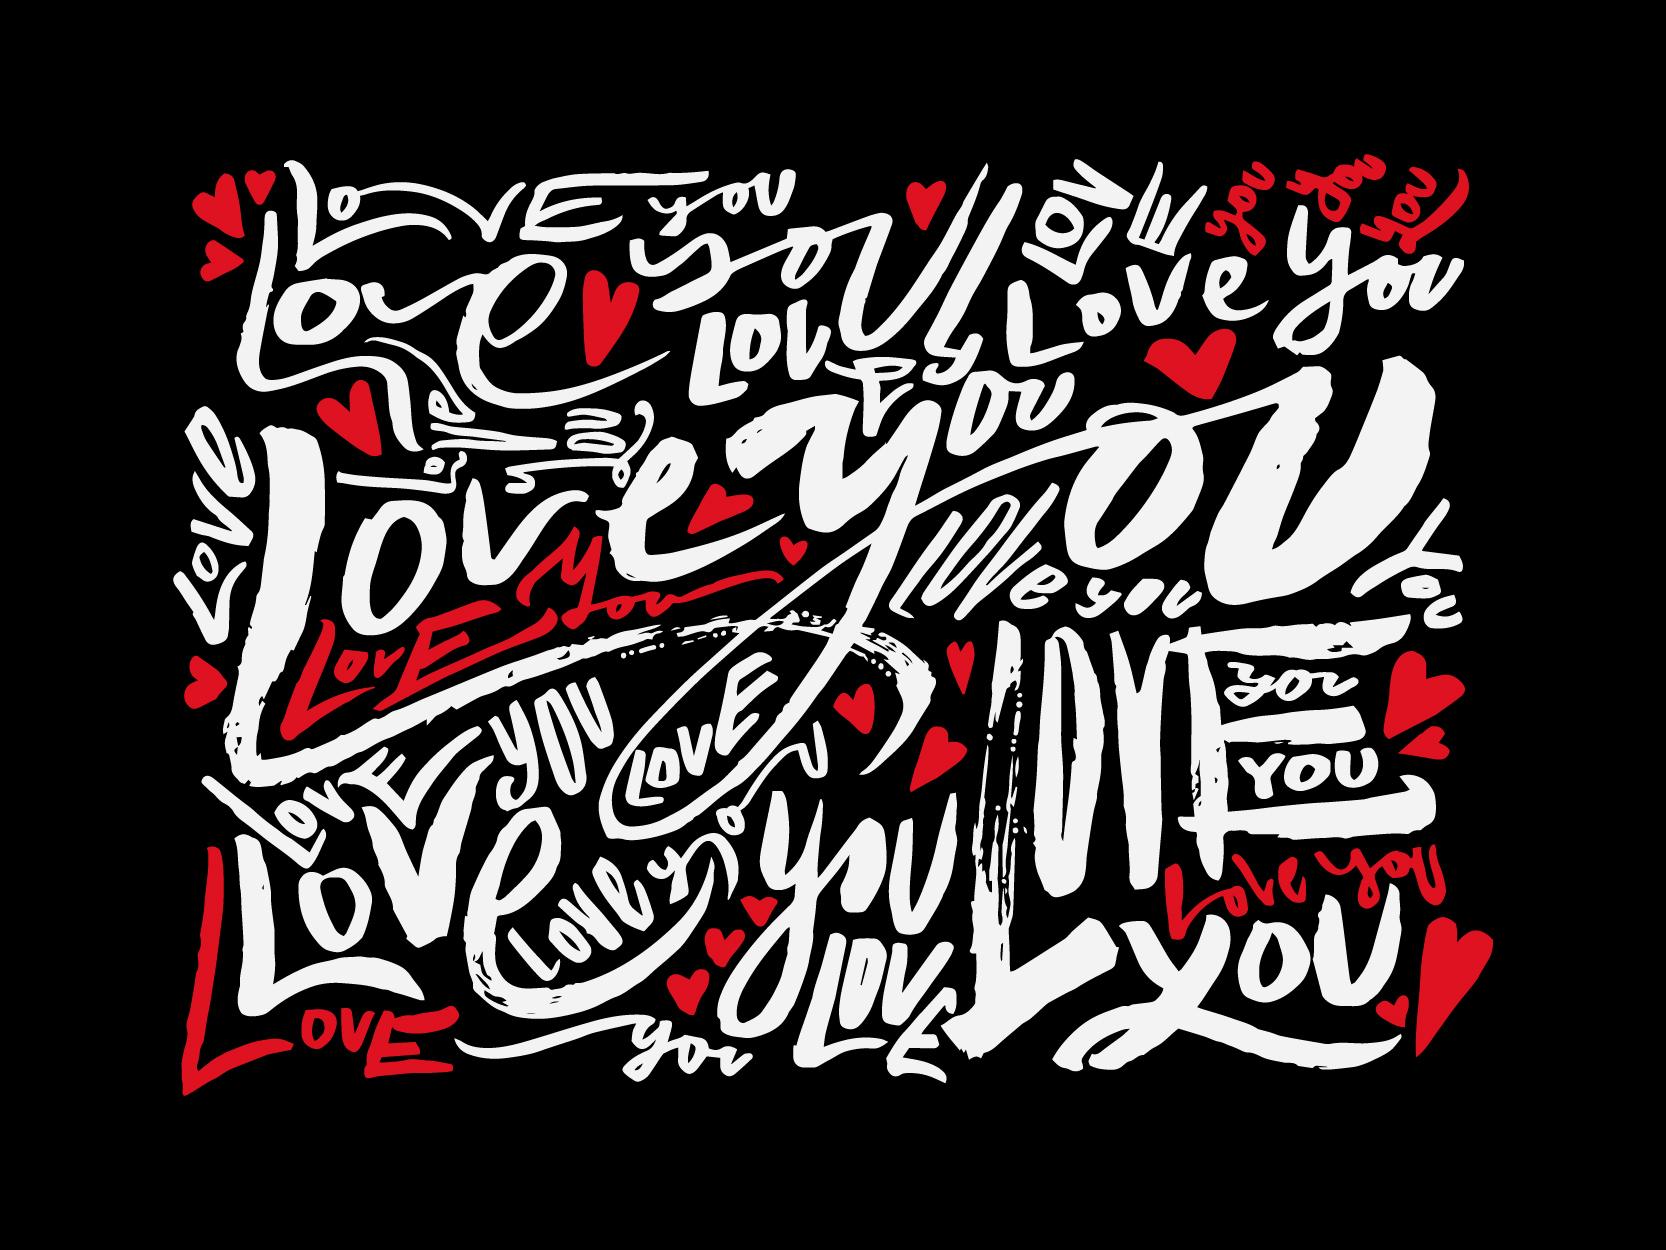 078. love you pattern 02